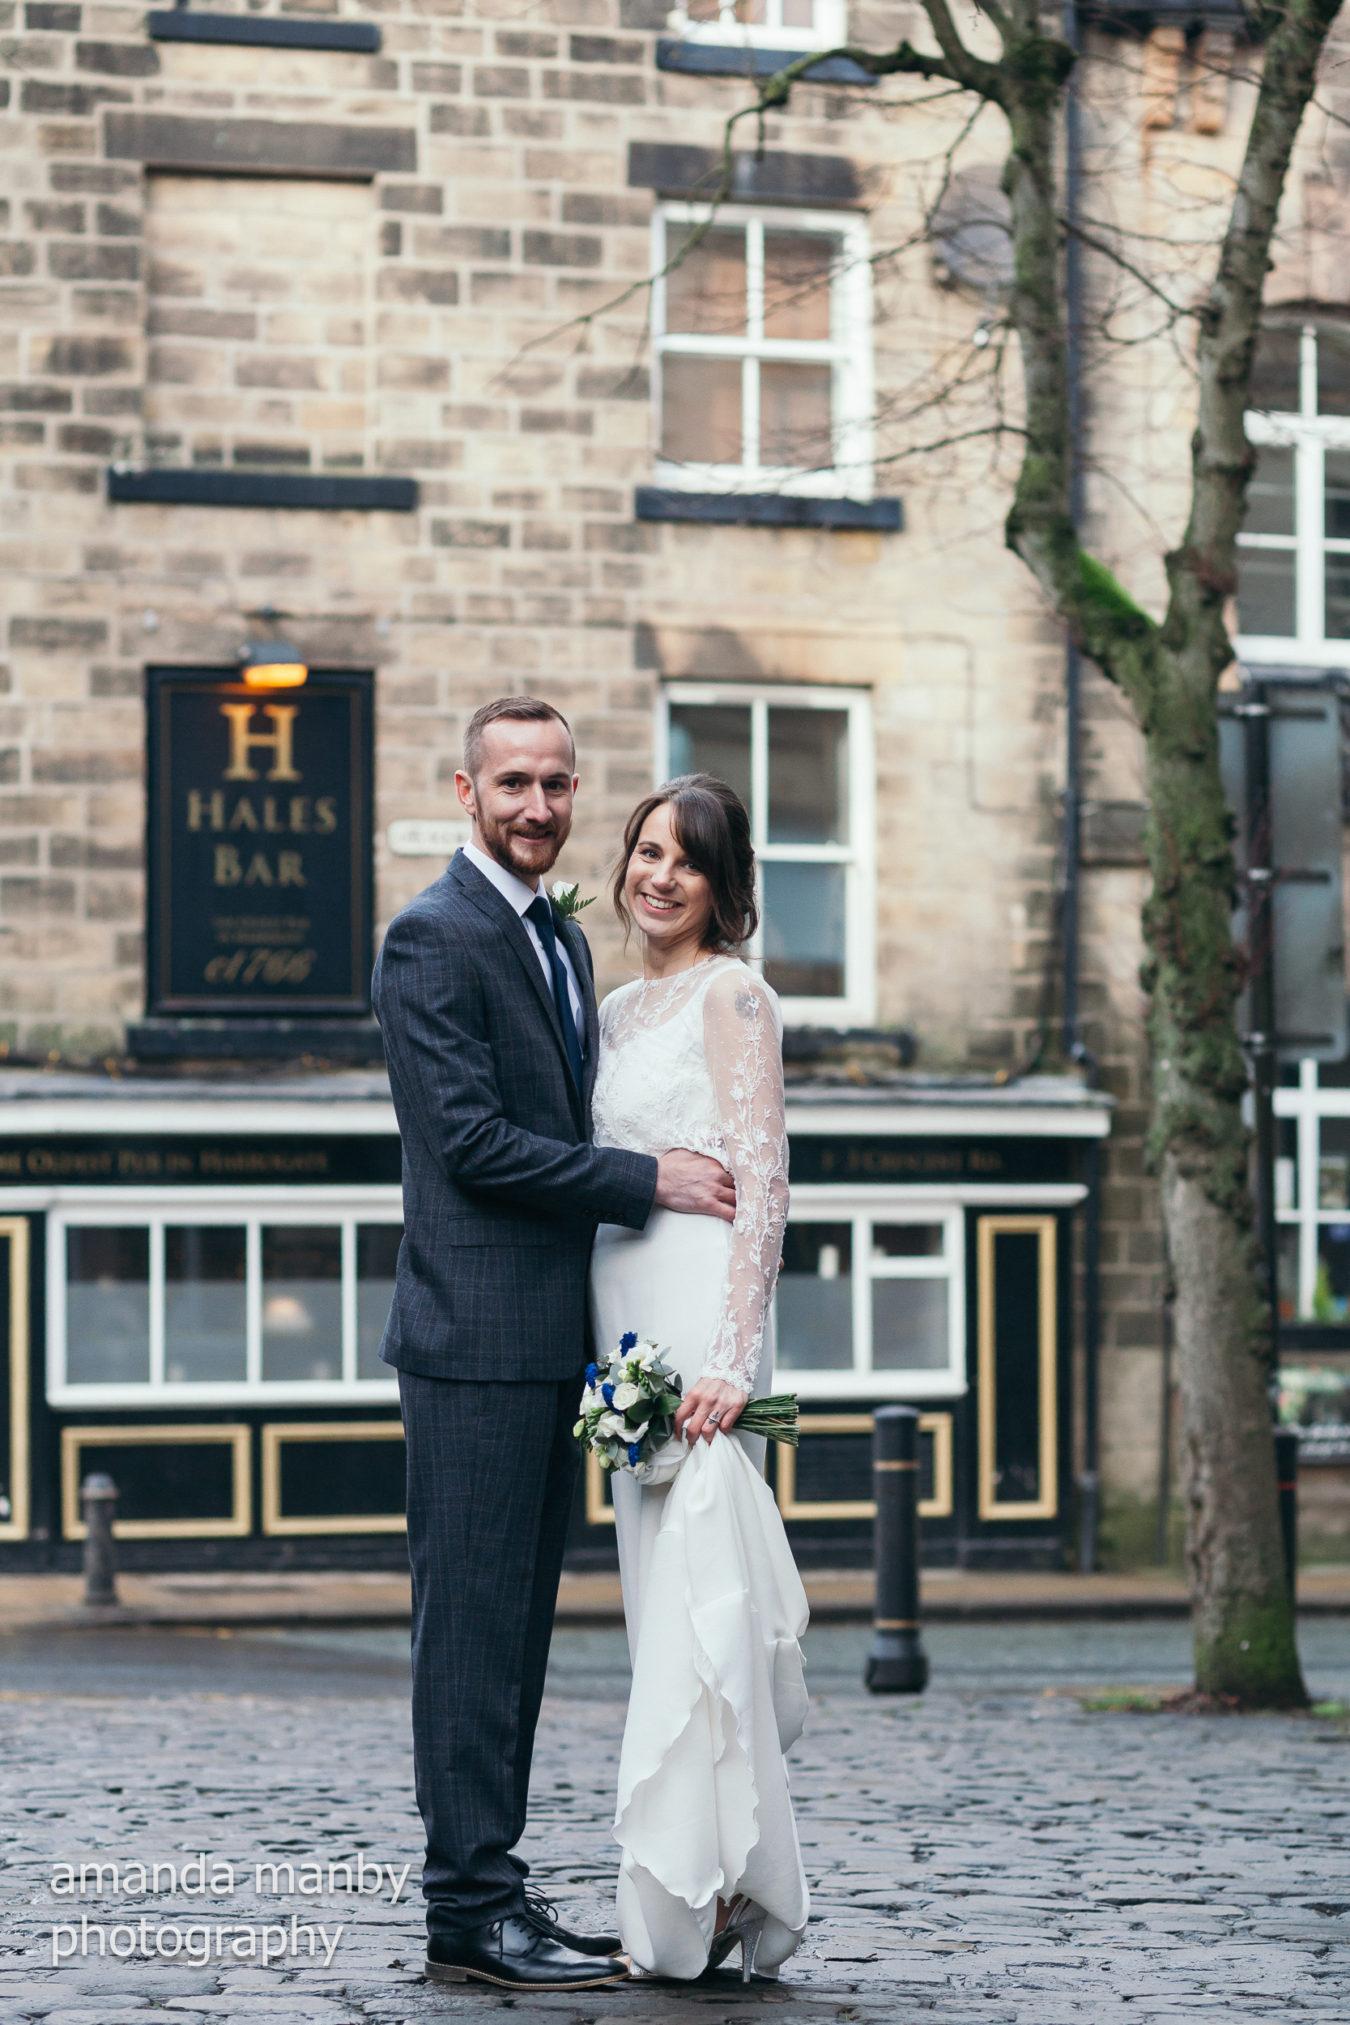 Crown Hotel Harrogate Wedding photographer